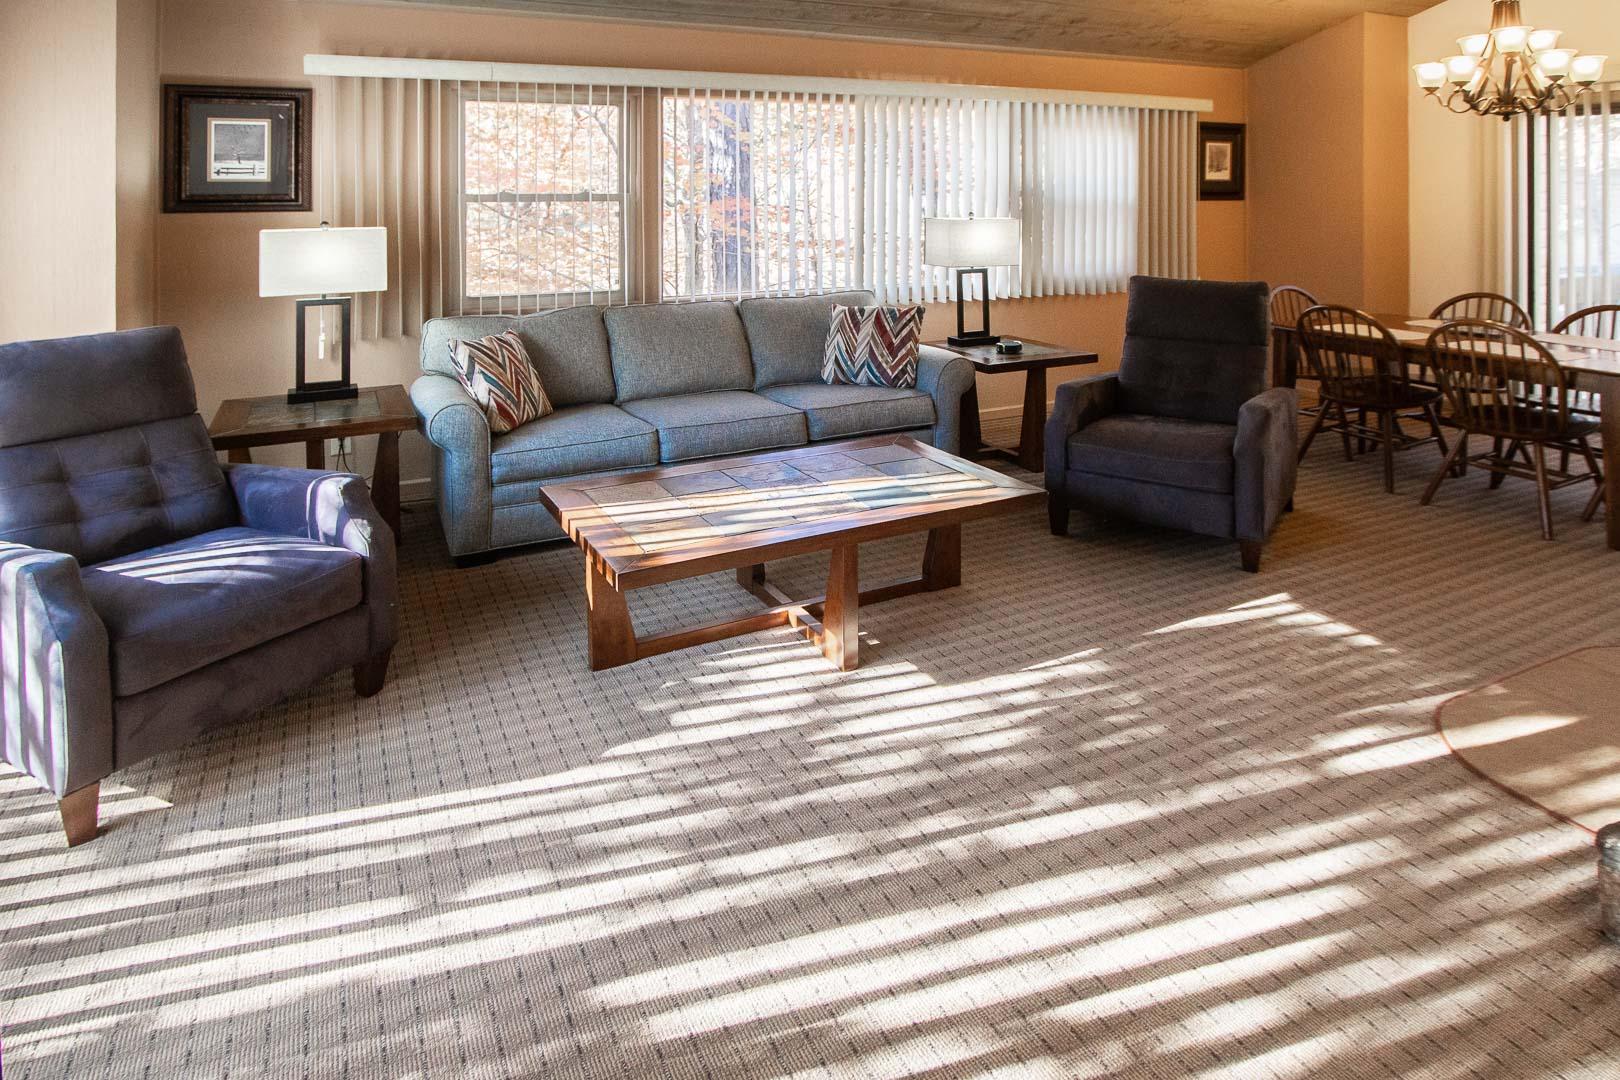 A spacious living room area at VRI's Fox Run Resort in North Carolina.